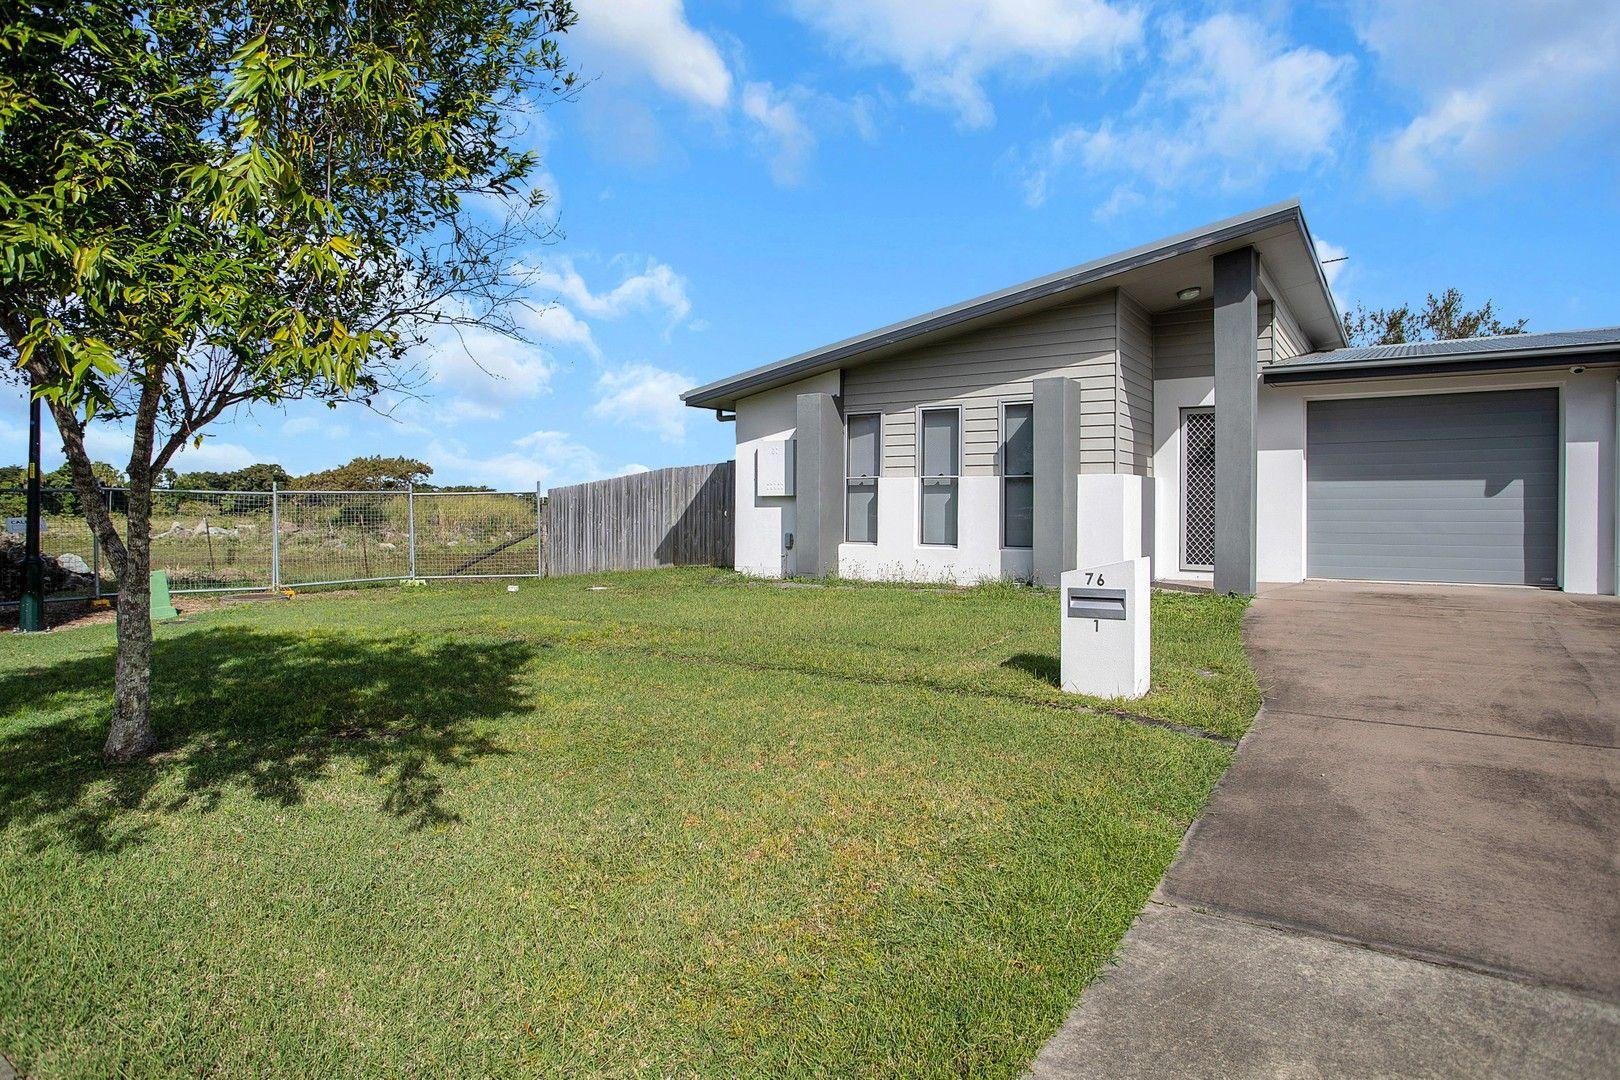 1/76 Cinnamon Drive, Glenella QLD 4740, Image 0